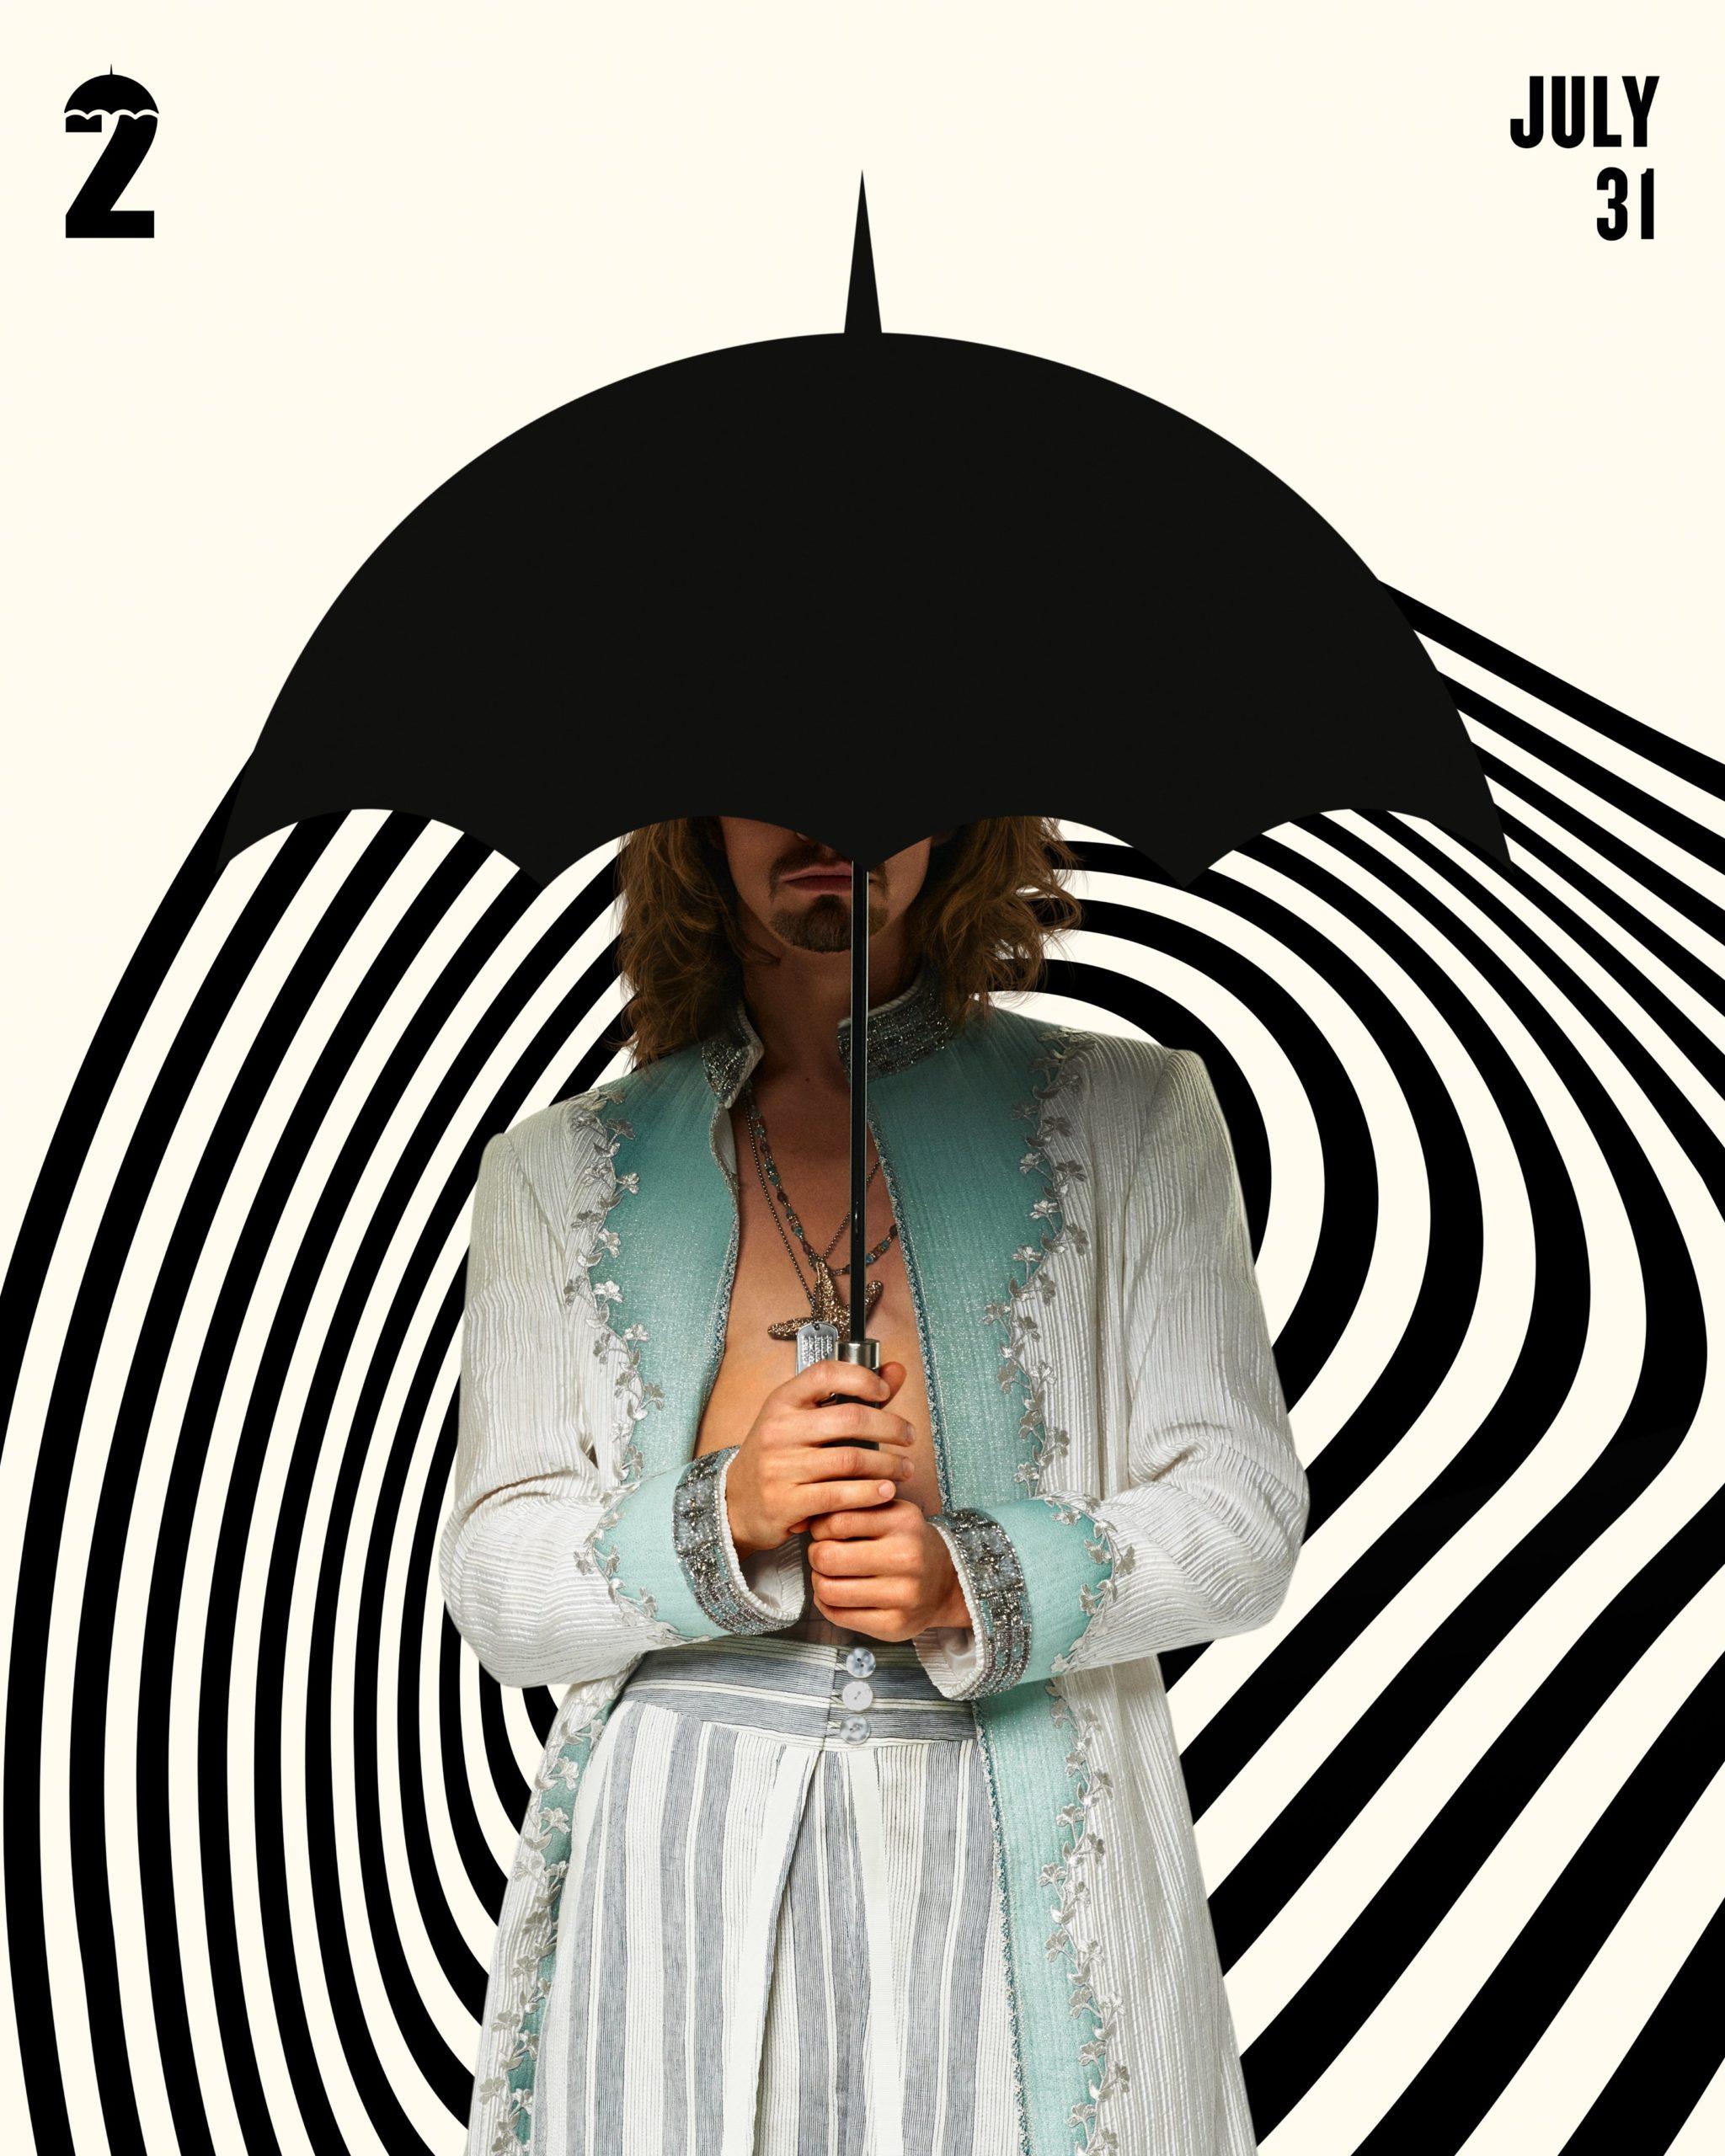 The Umbrella Academy – Klaus